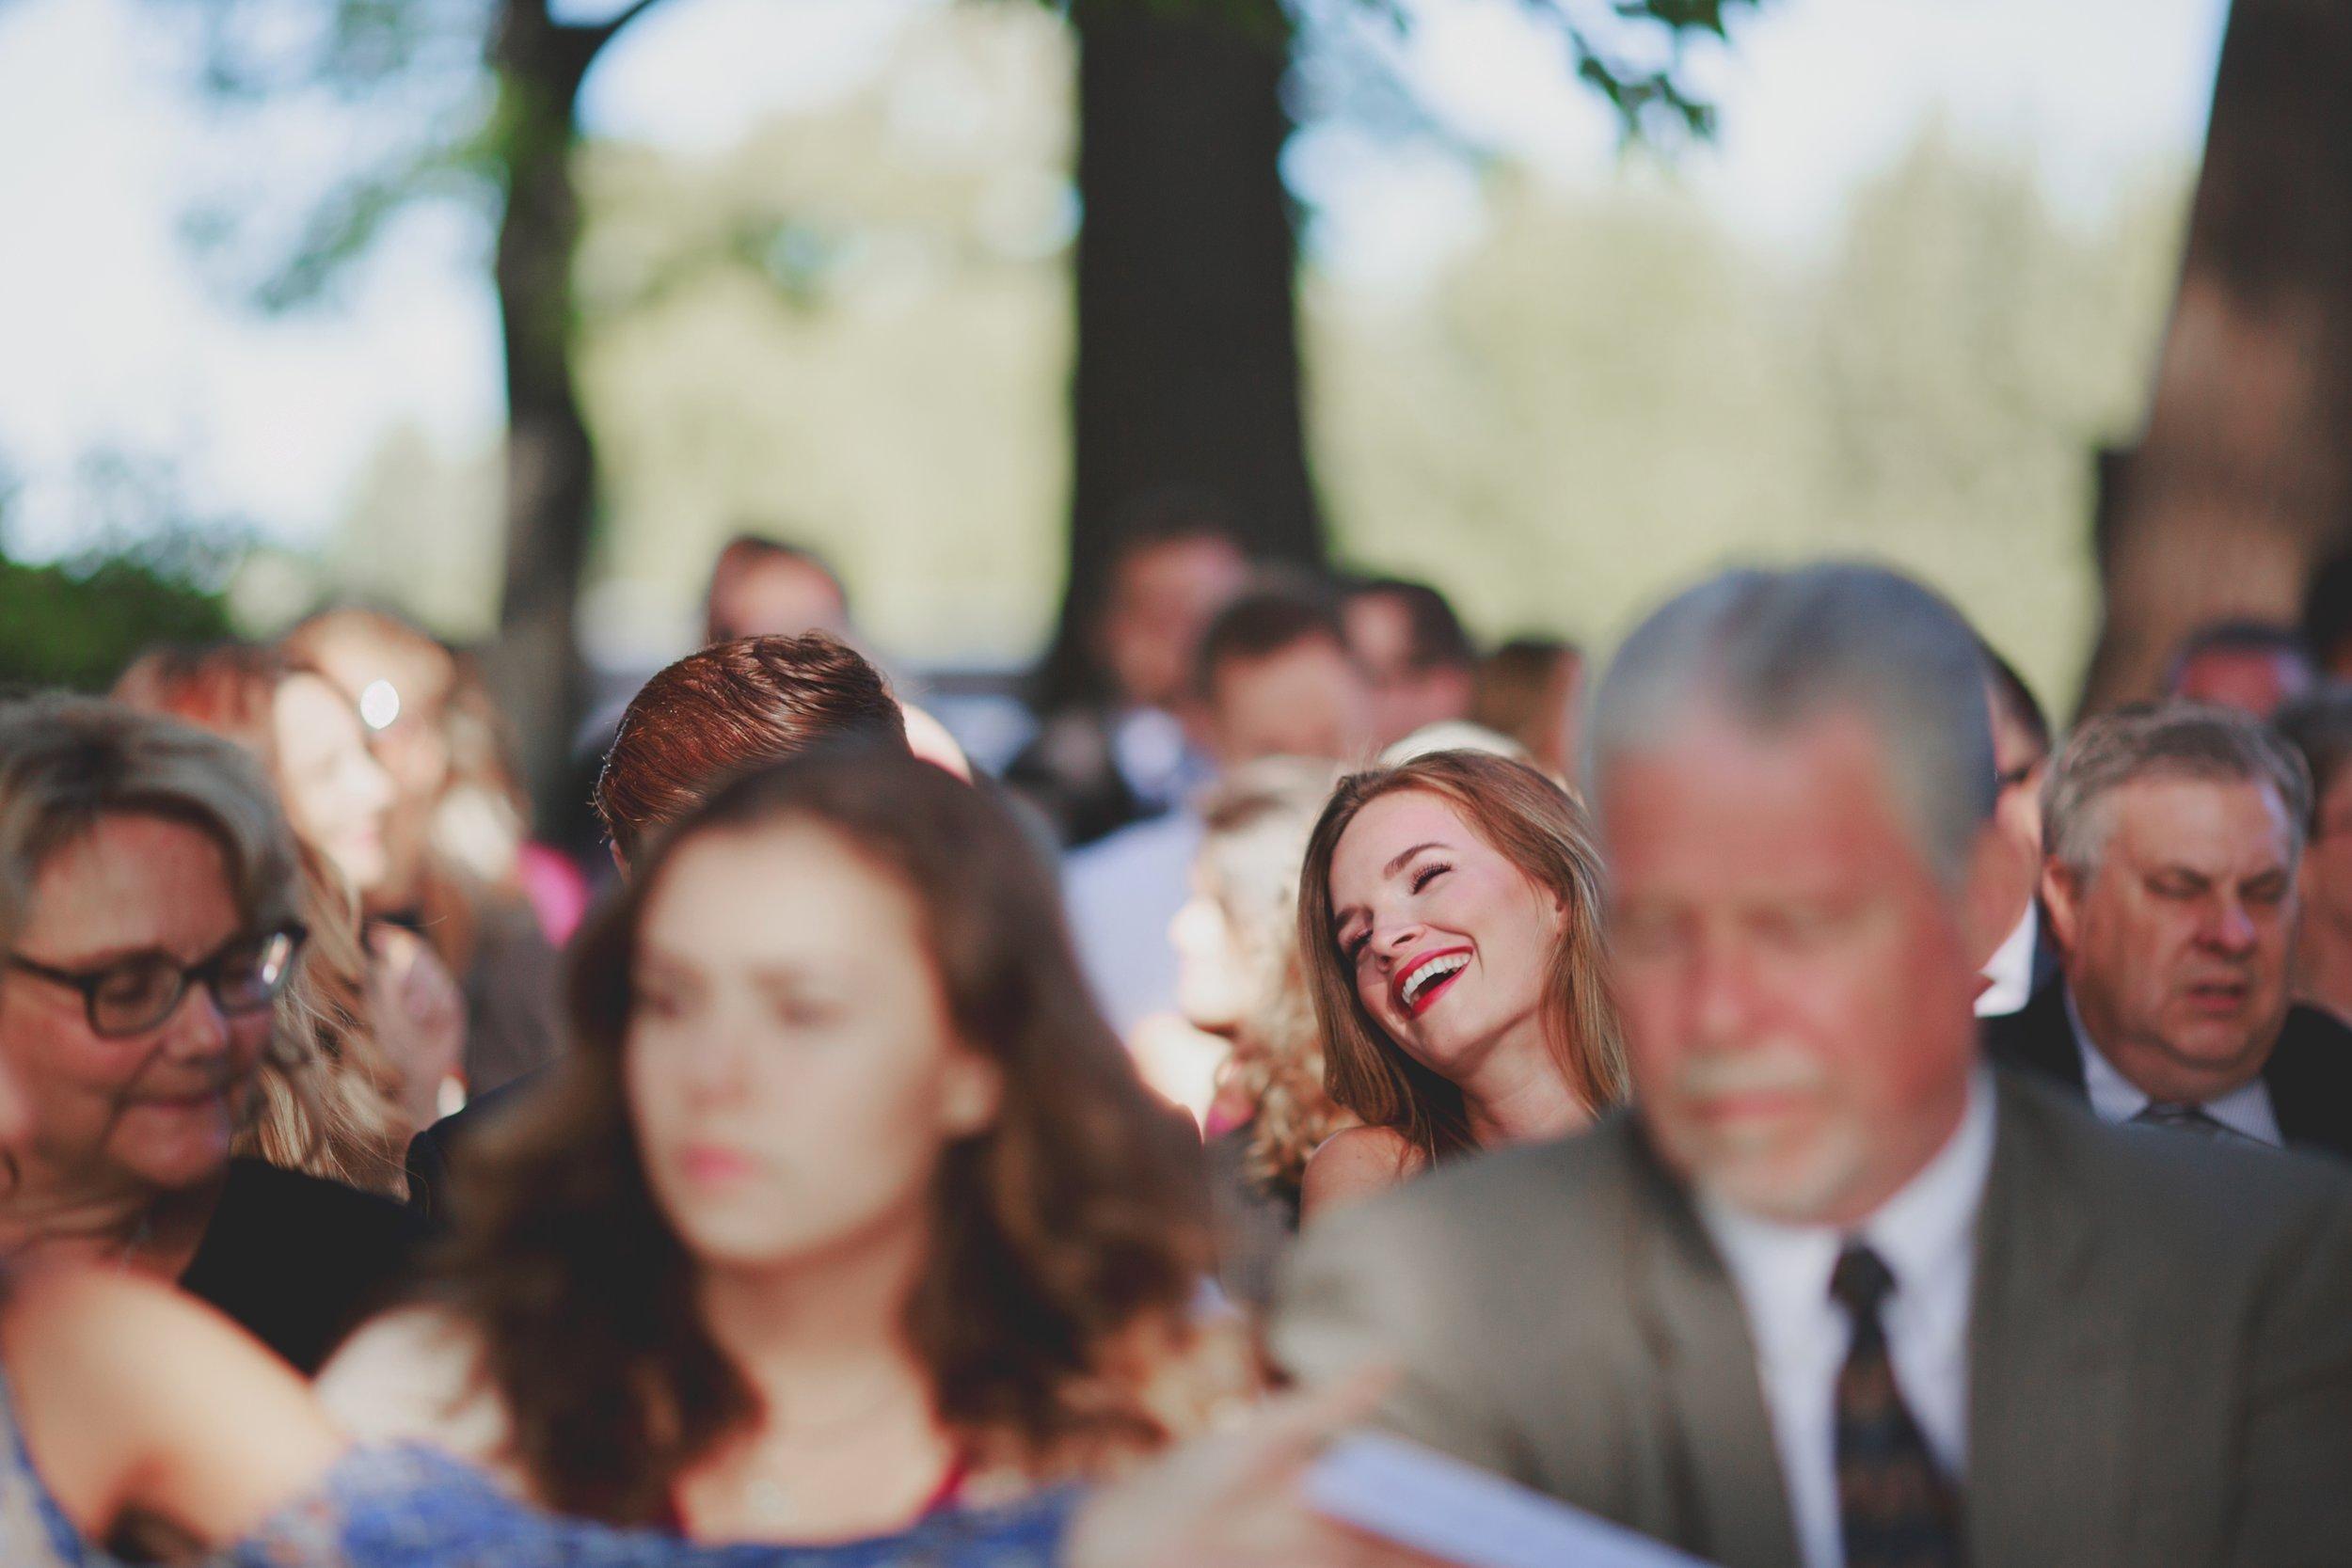 traverse_city_wedding_043.jpg